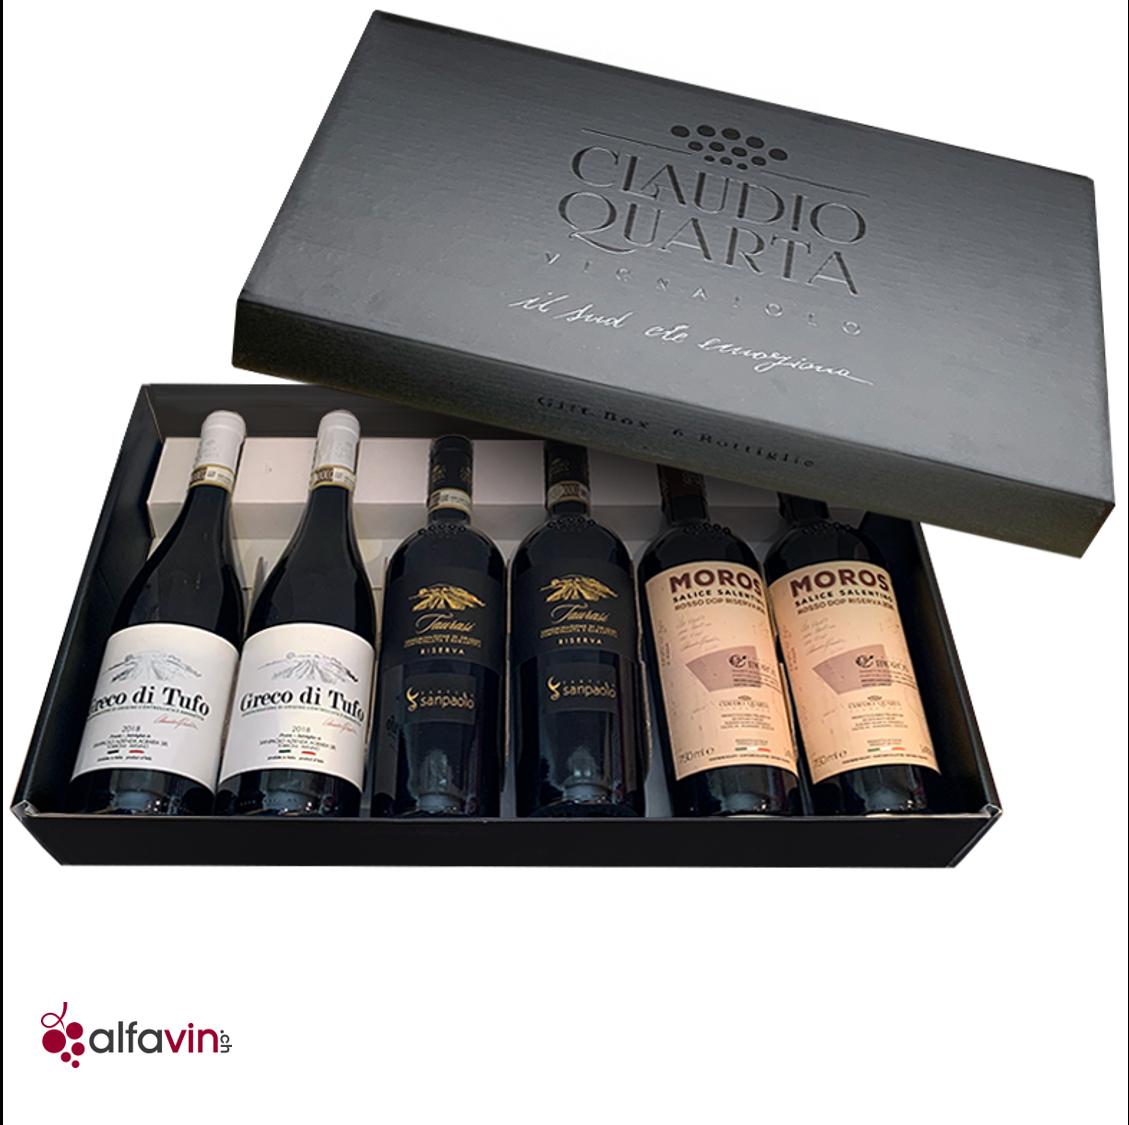 C. Quarta Premium Box: for the most demanding customers